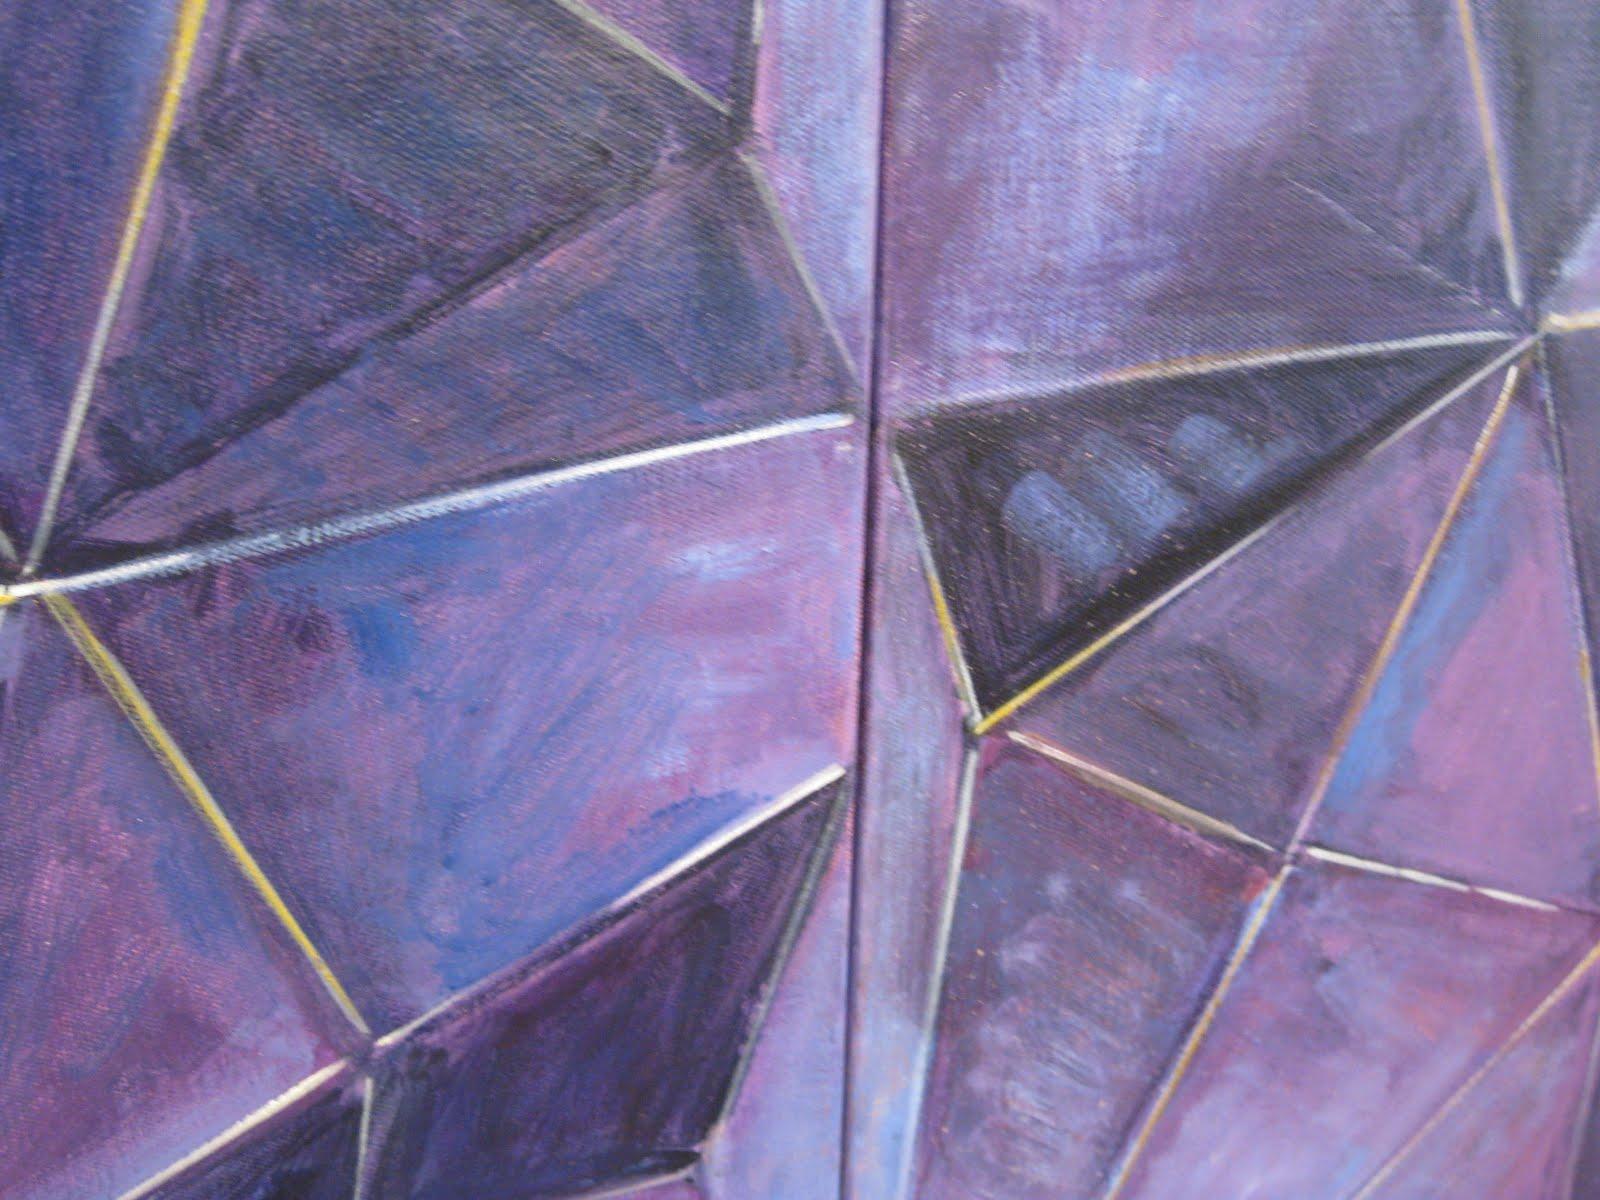 Purple 3d design wallpaper purple background wallpapers for Purple wallpaper 3d